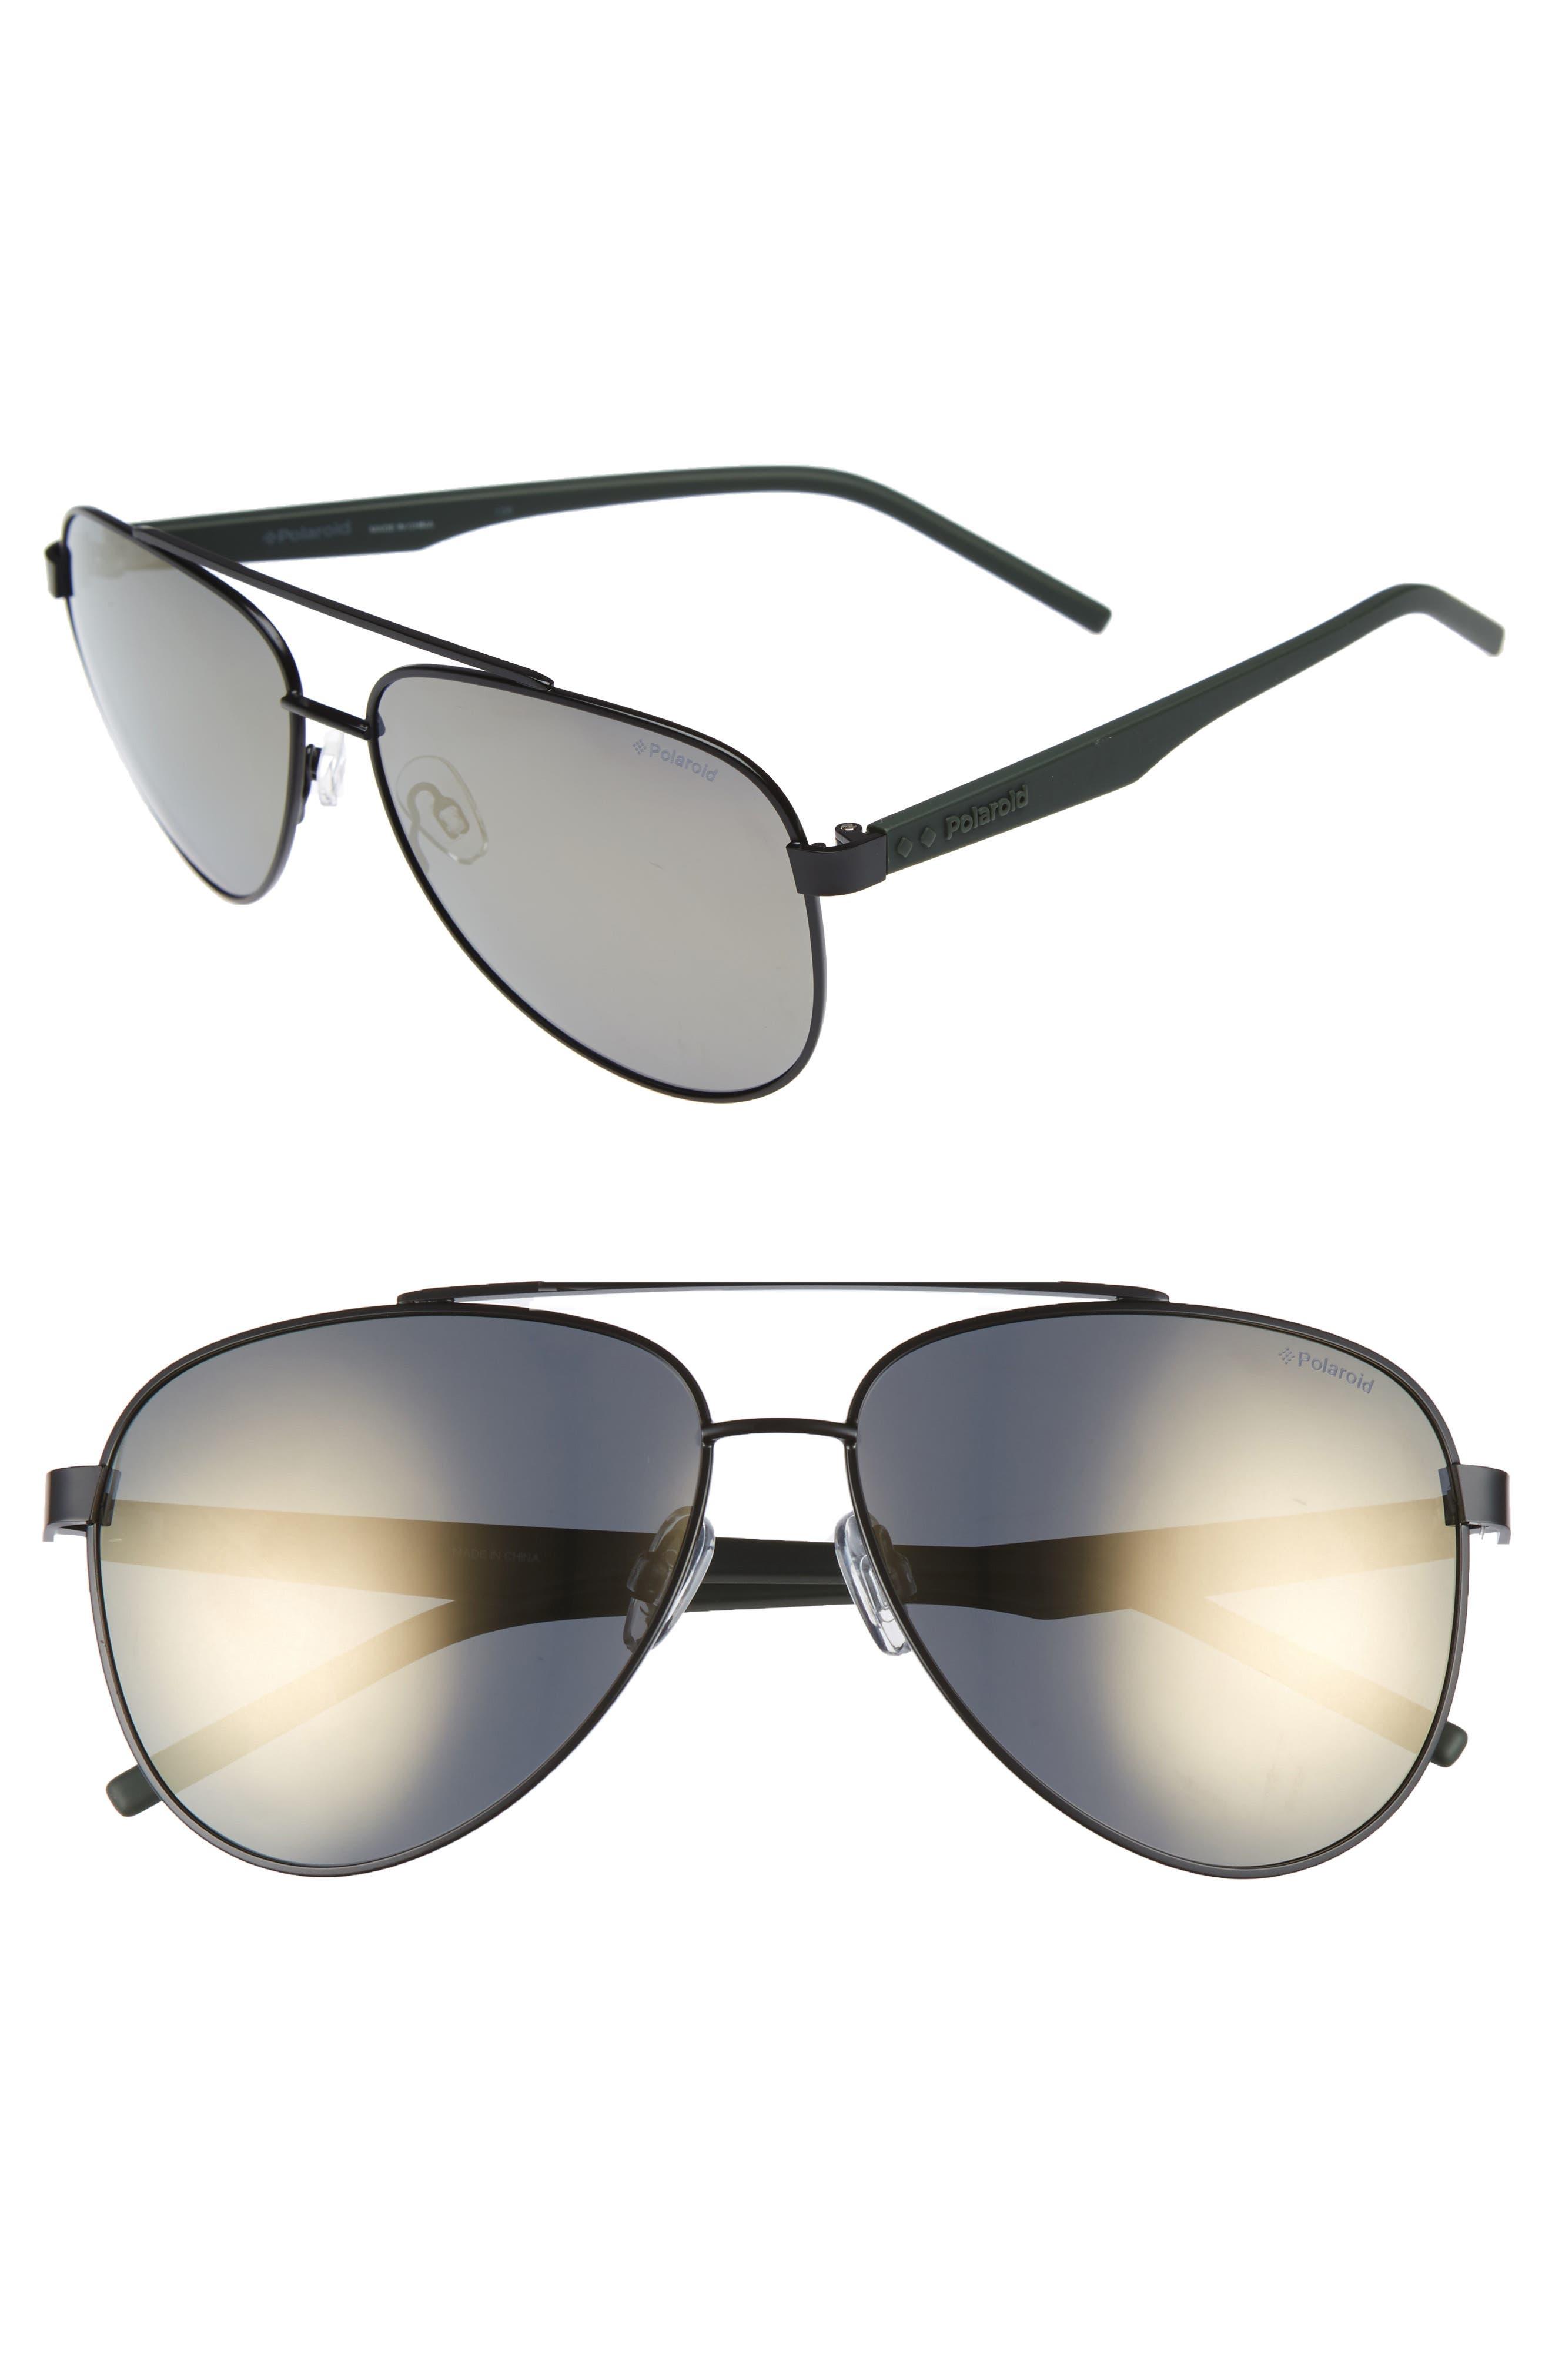 Polaroid 61Mm Polarized Aviator Sunglasses -